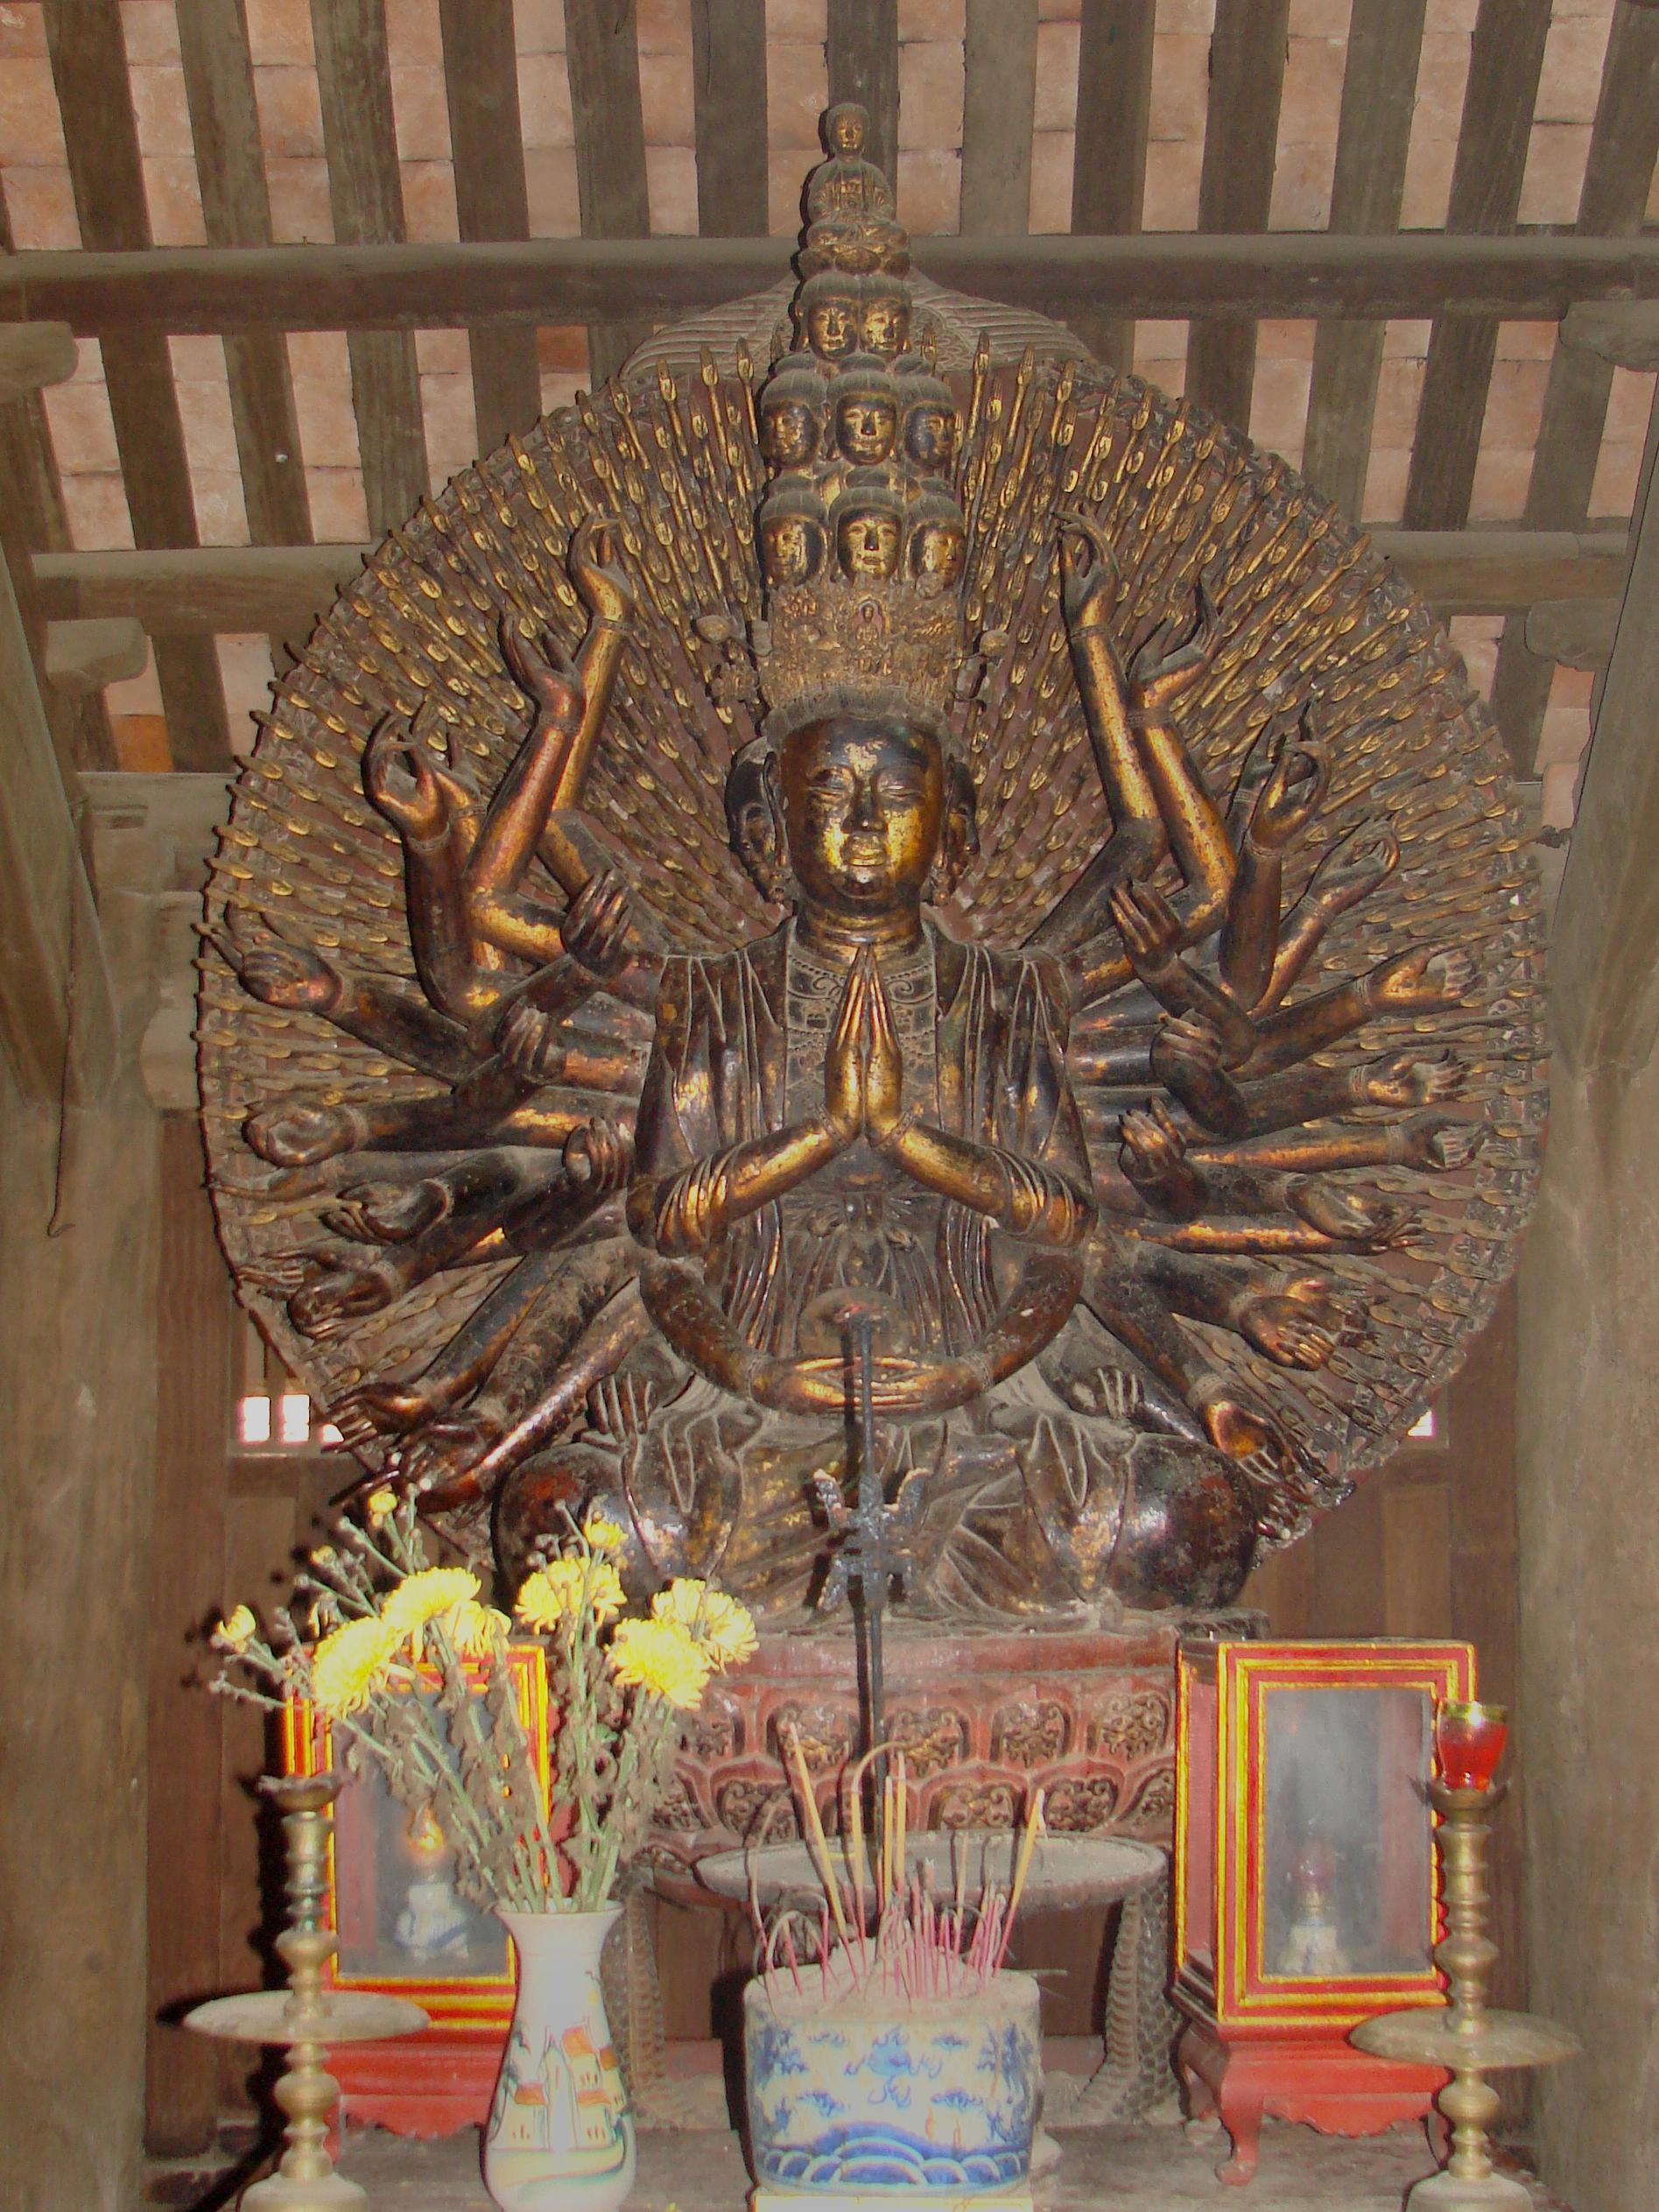 https://upload.wikimedia.org/wikipedia/commons/7/76/La_statue_de_Quan_Am_dans_la_pagode_But_Thap.jpg